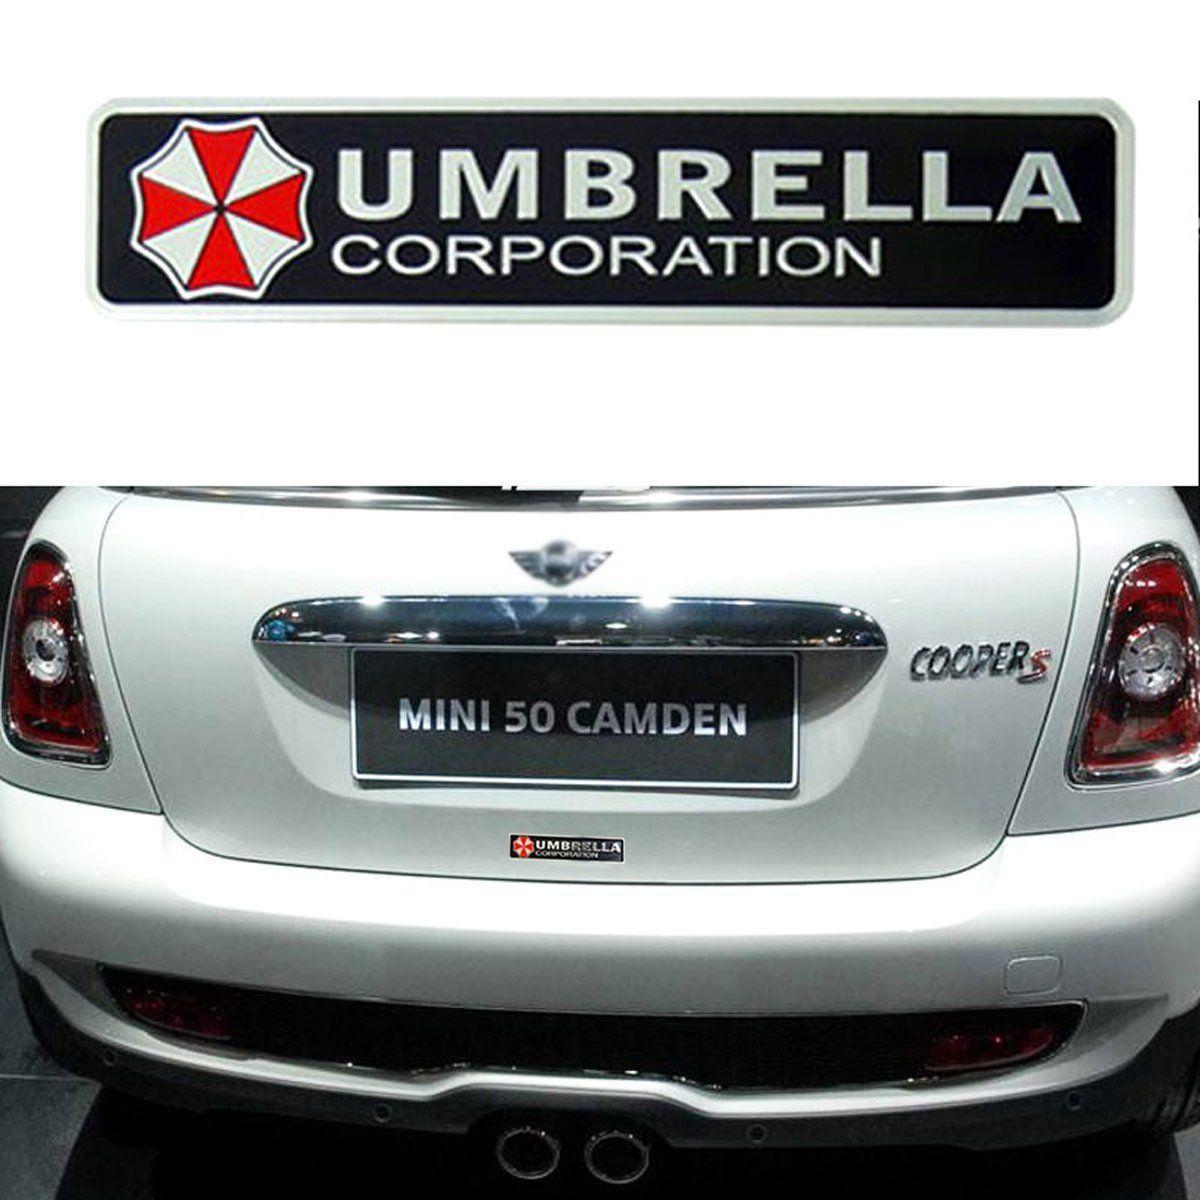 Resident Evil Umbrella Corporation Car Vinyl Whole Body Graphic Decal Sticker Wish